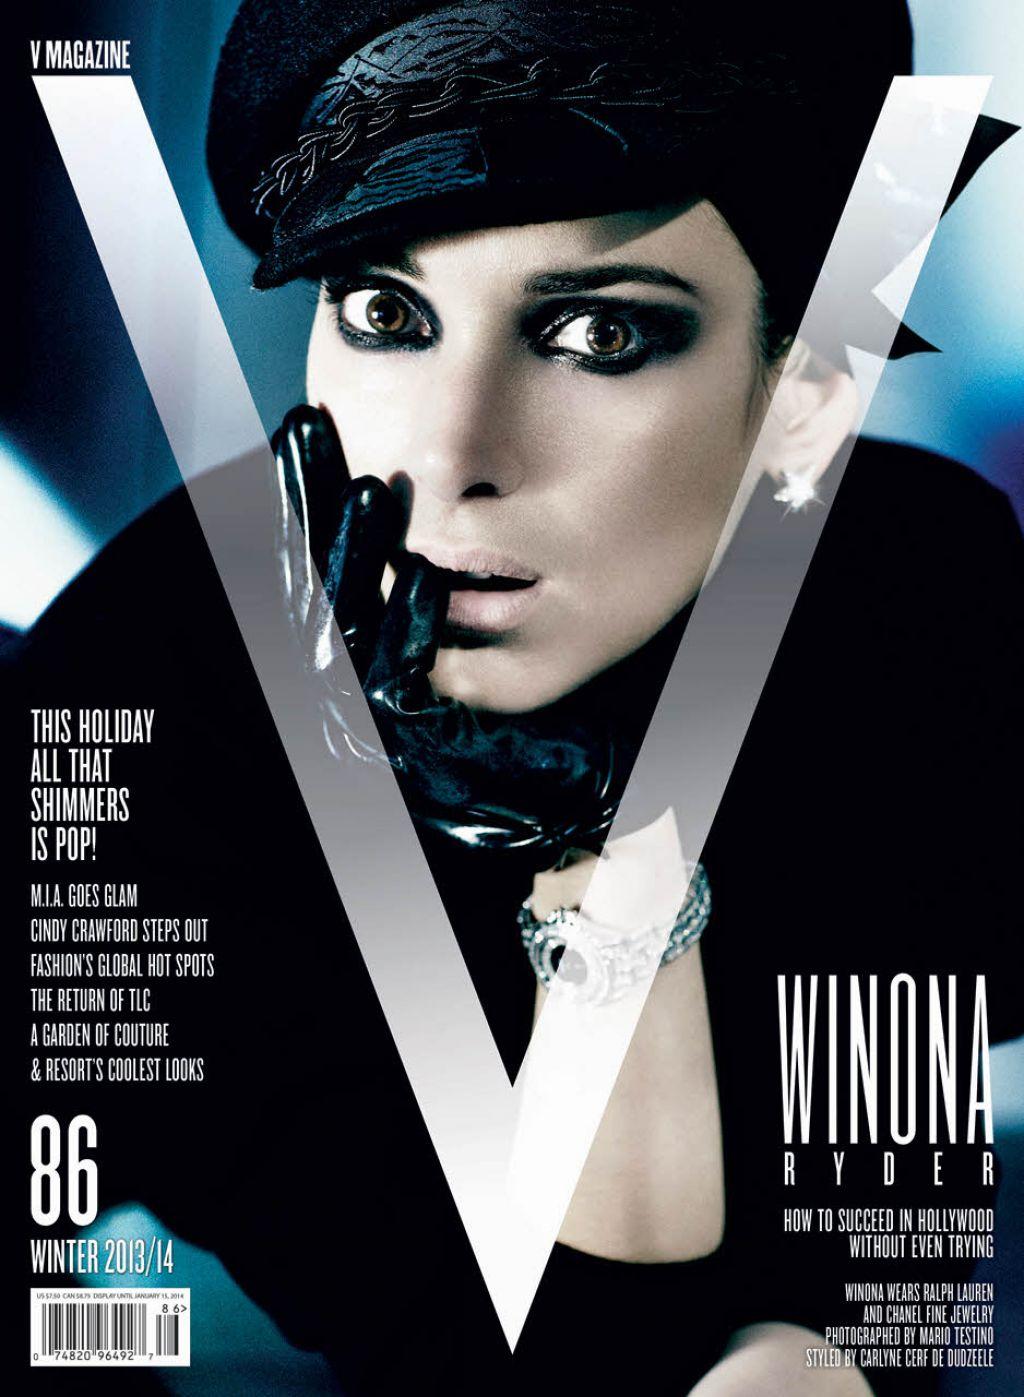 Winona Ryder - V MagazinePhotoshoot  - Winter 2013/2014